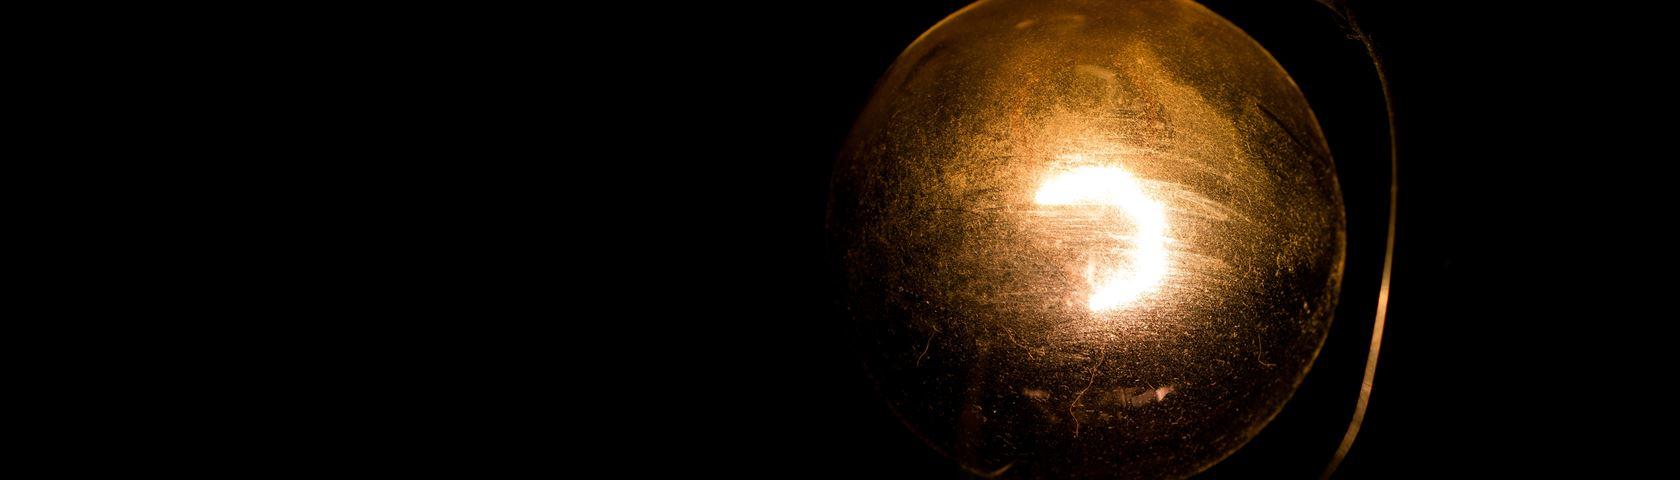 Dirty Light Bulb